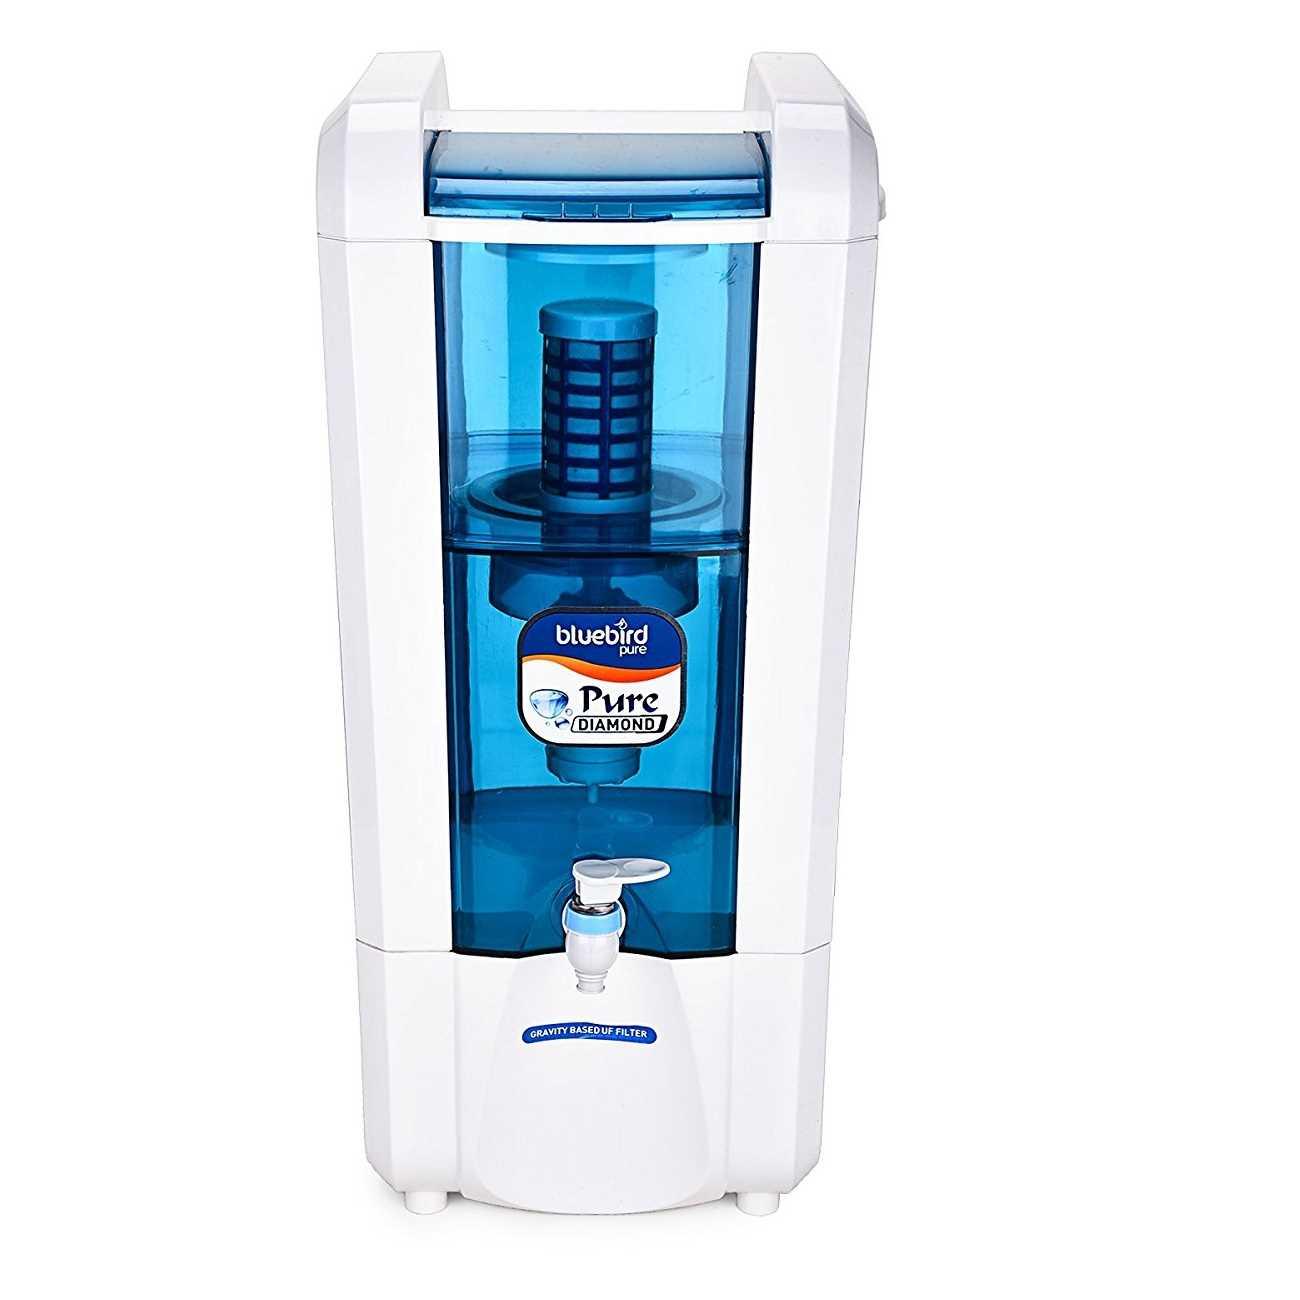 Bluebird Pure Diamond Gravity Based Water Purifier